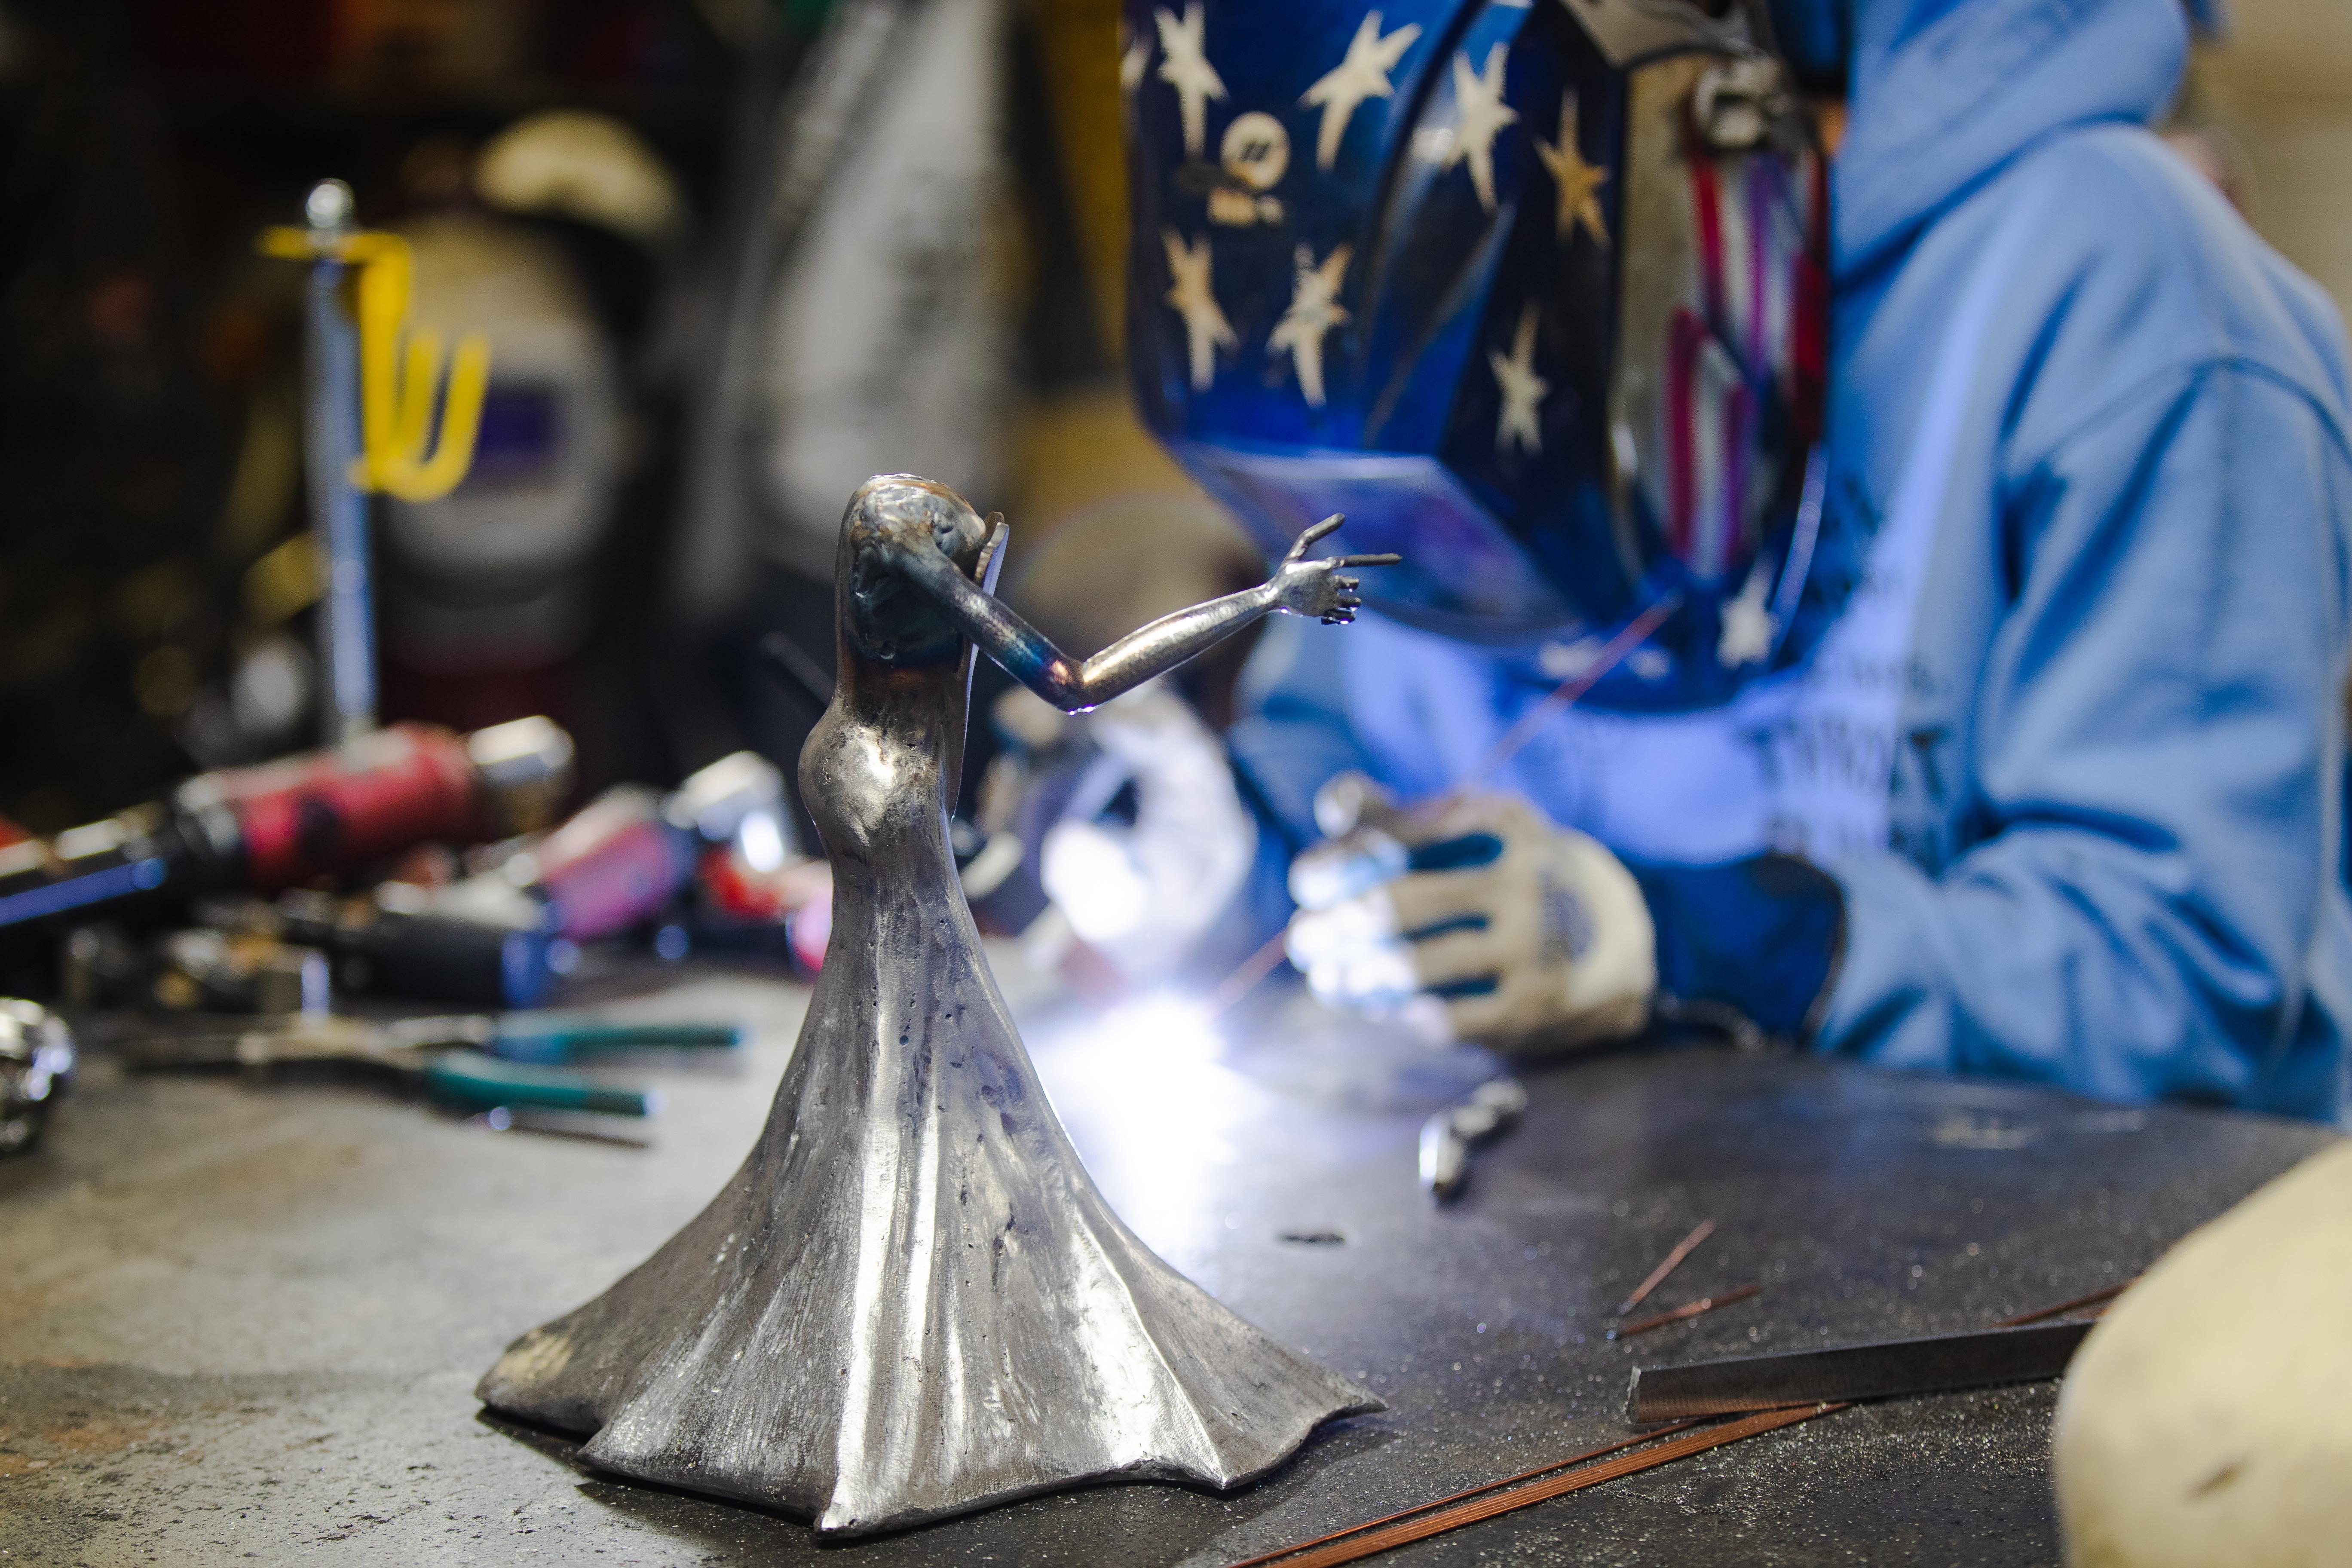 Barbie The Welder TIG welding Matilda Bat woman